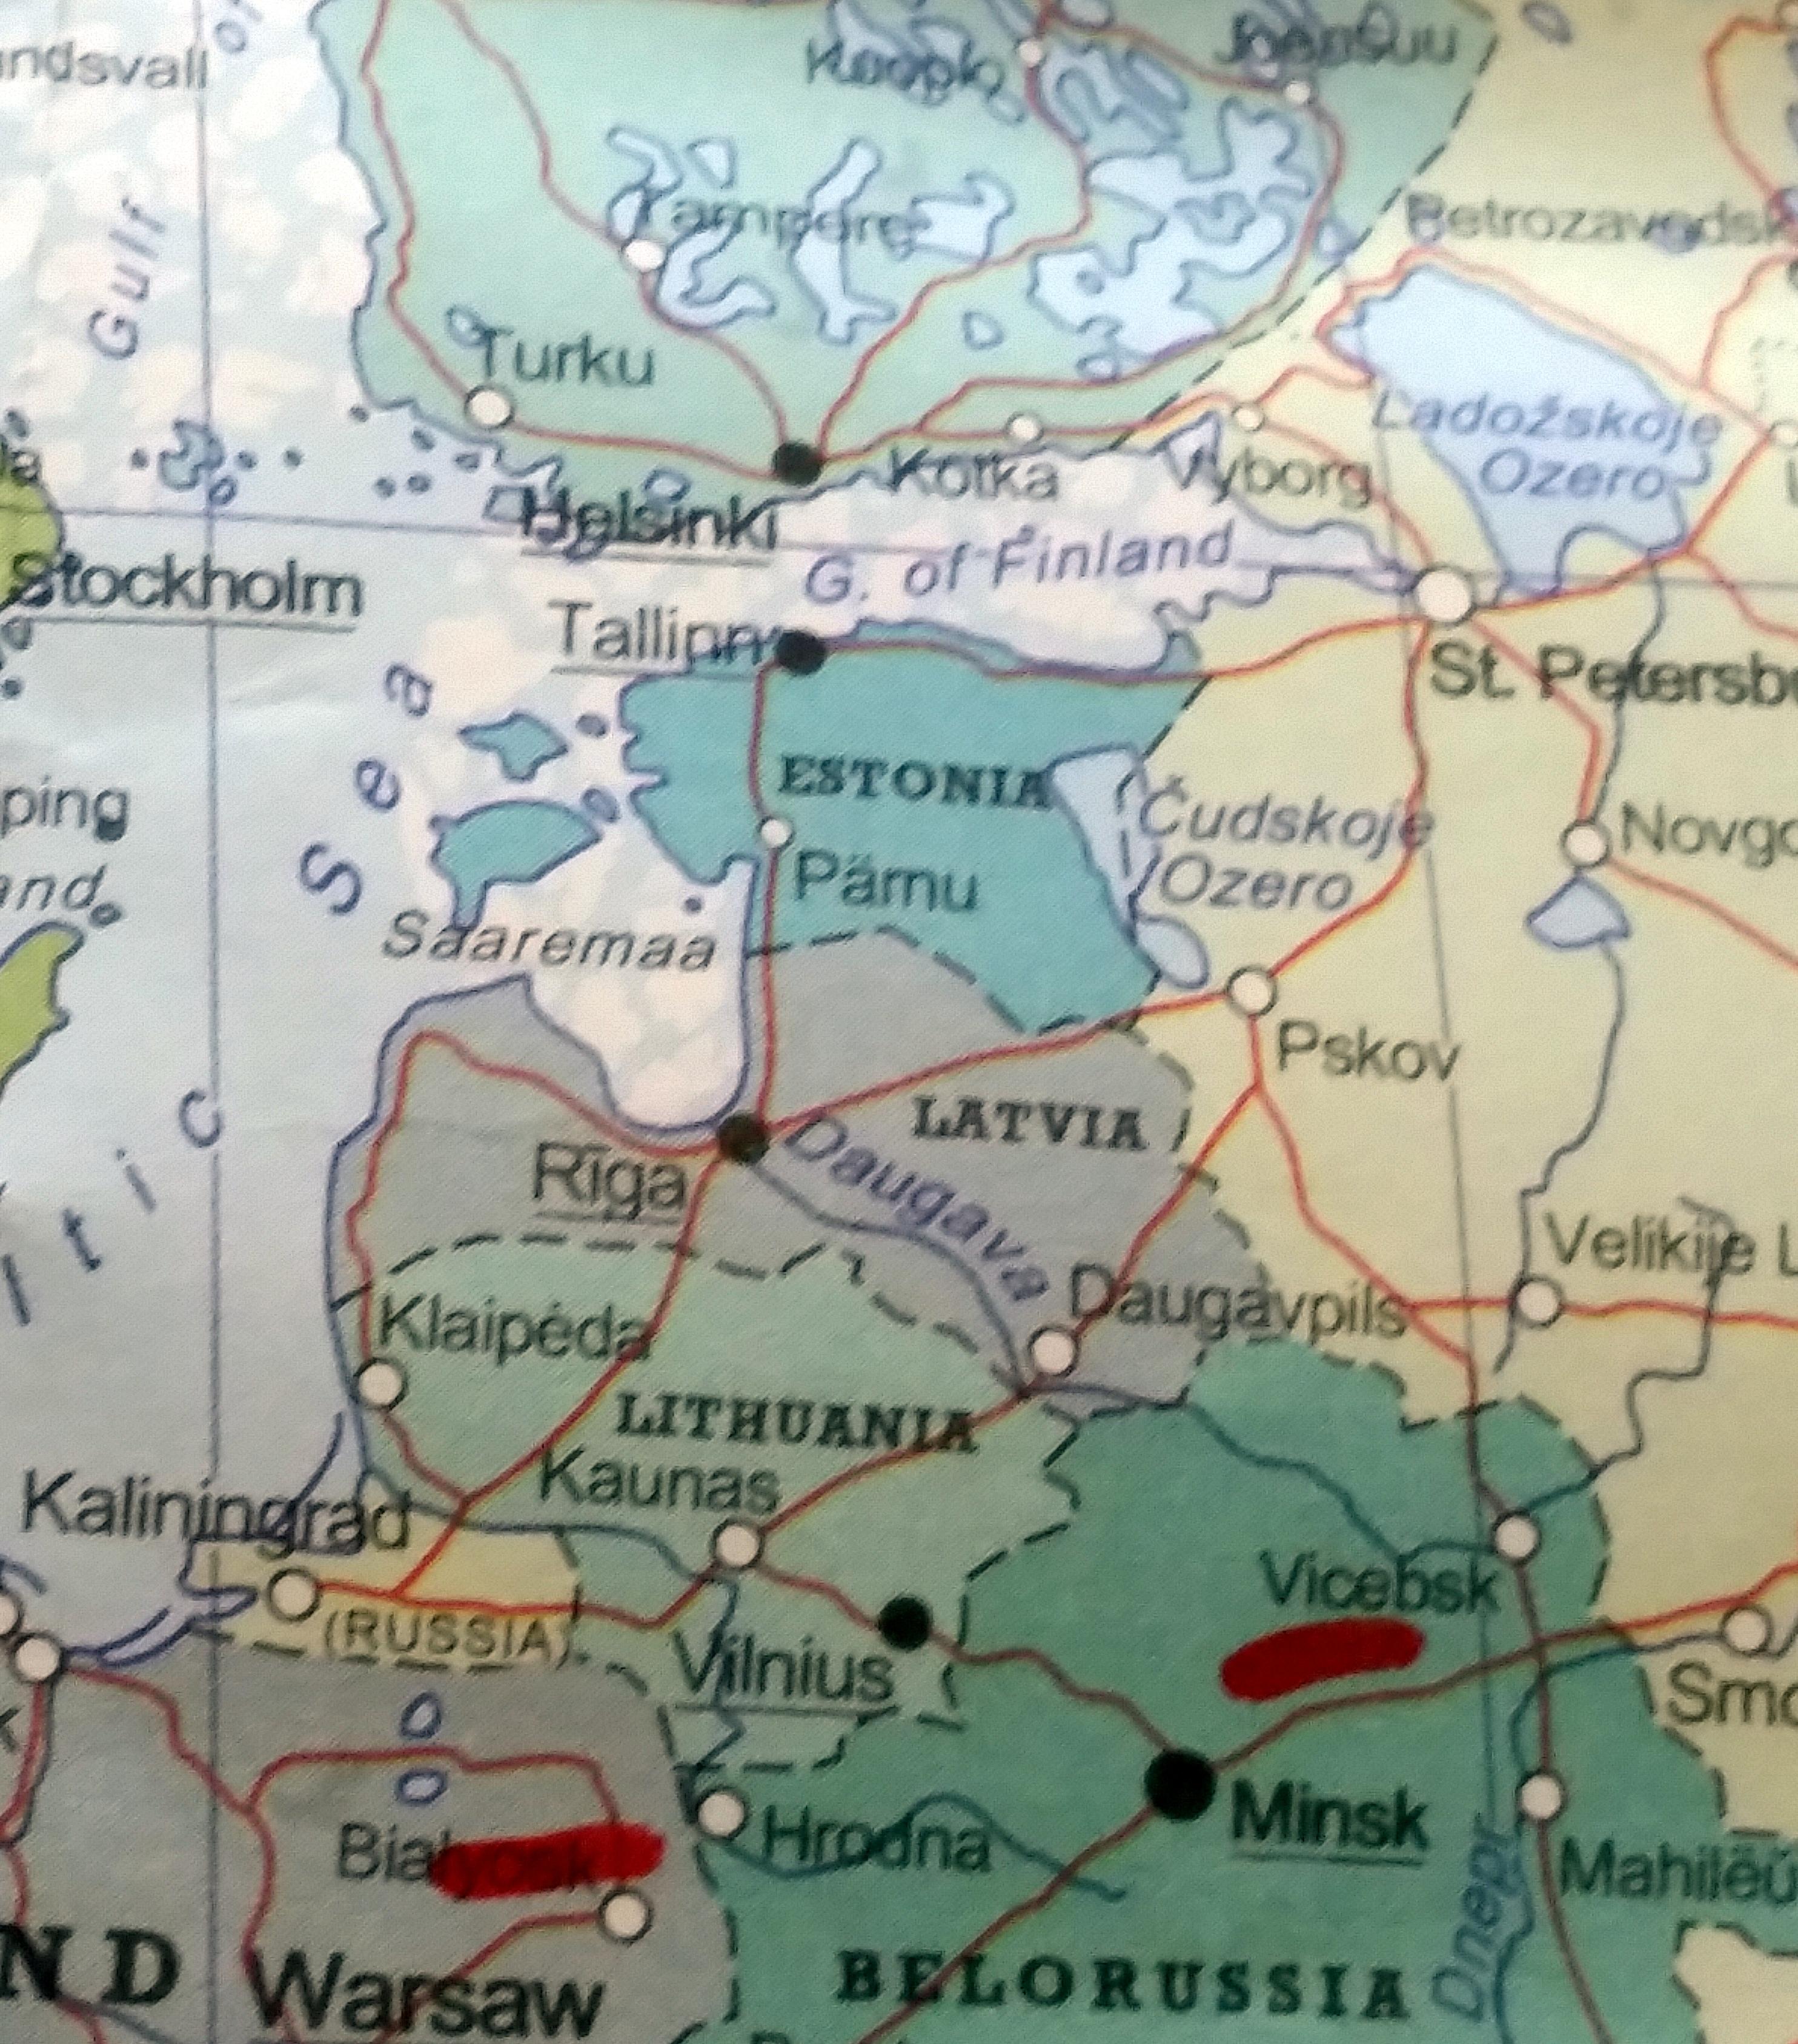 The Baltics: Estonia, Latvia and Lithuania